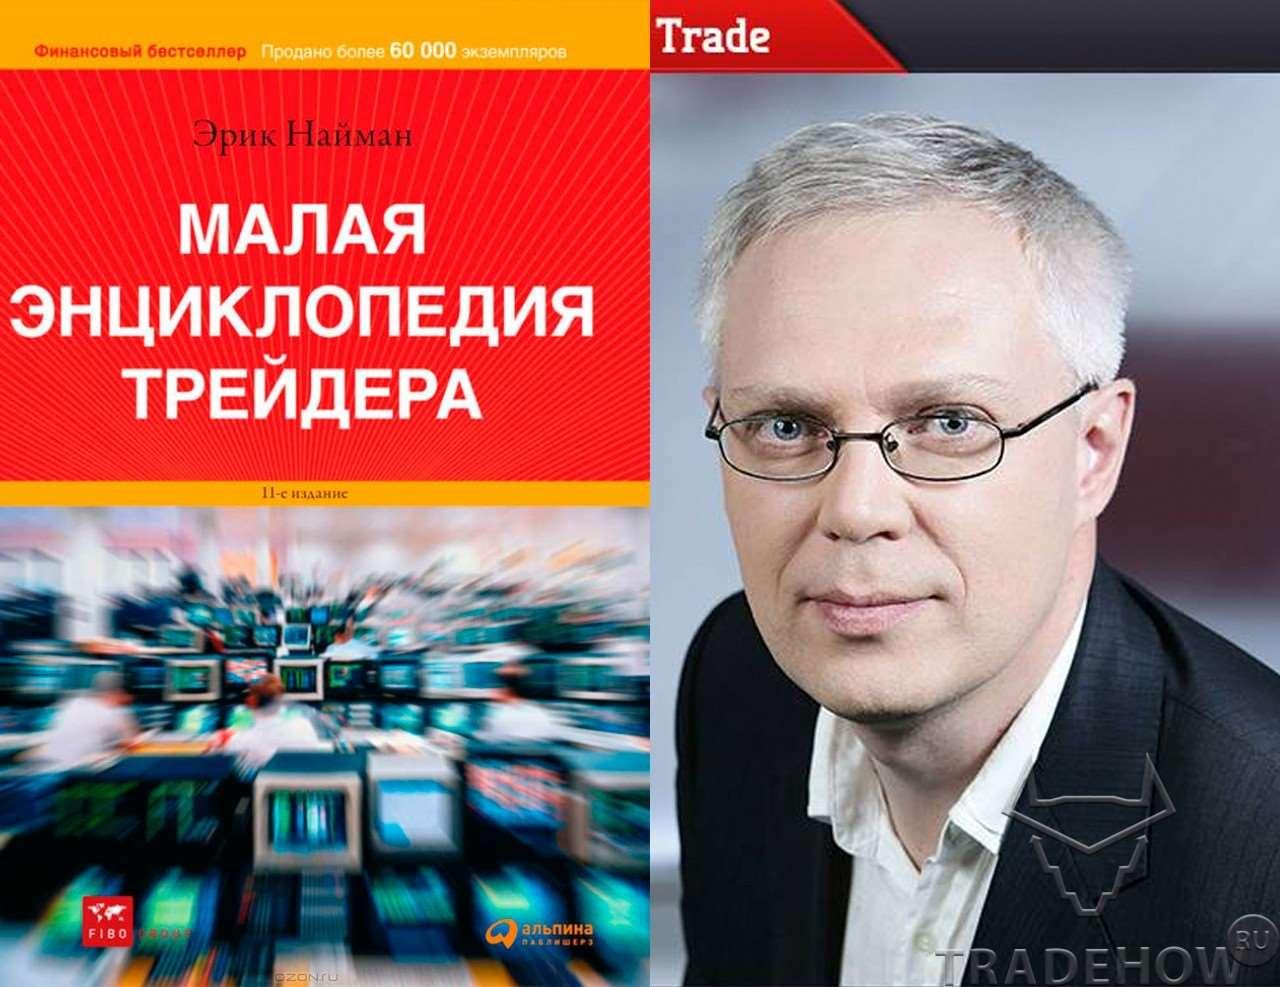 Эрик Найман «Малая энциклопедия трейдера»